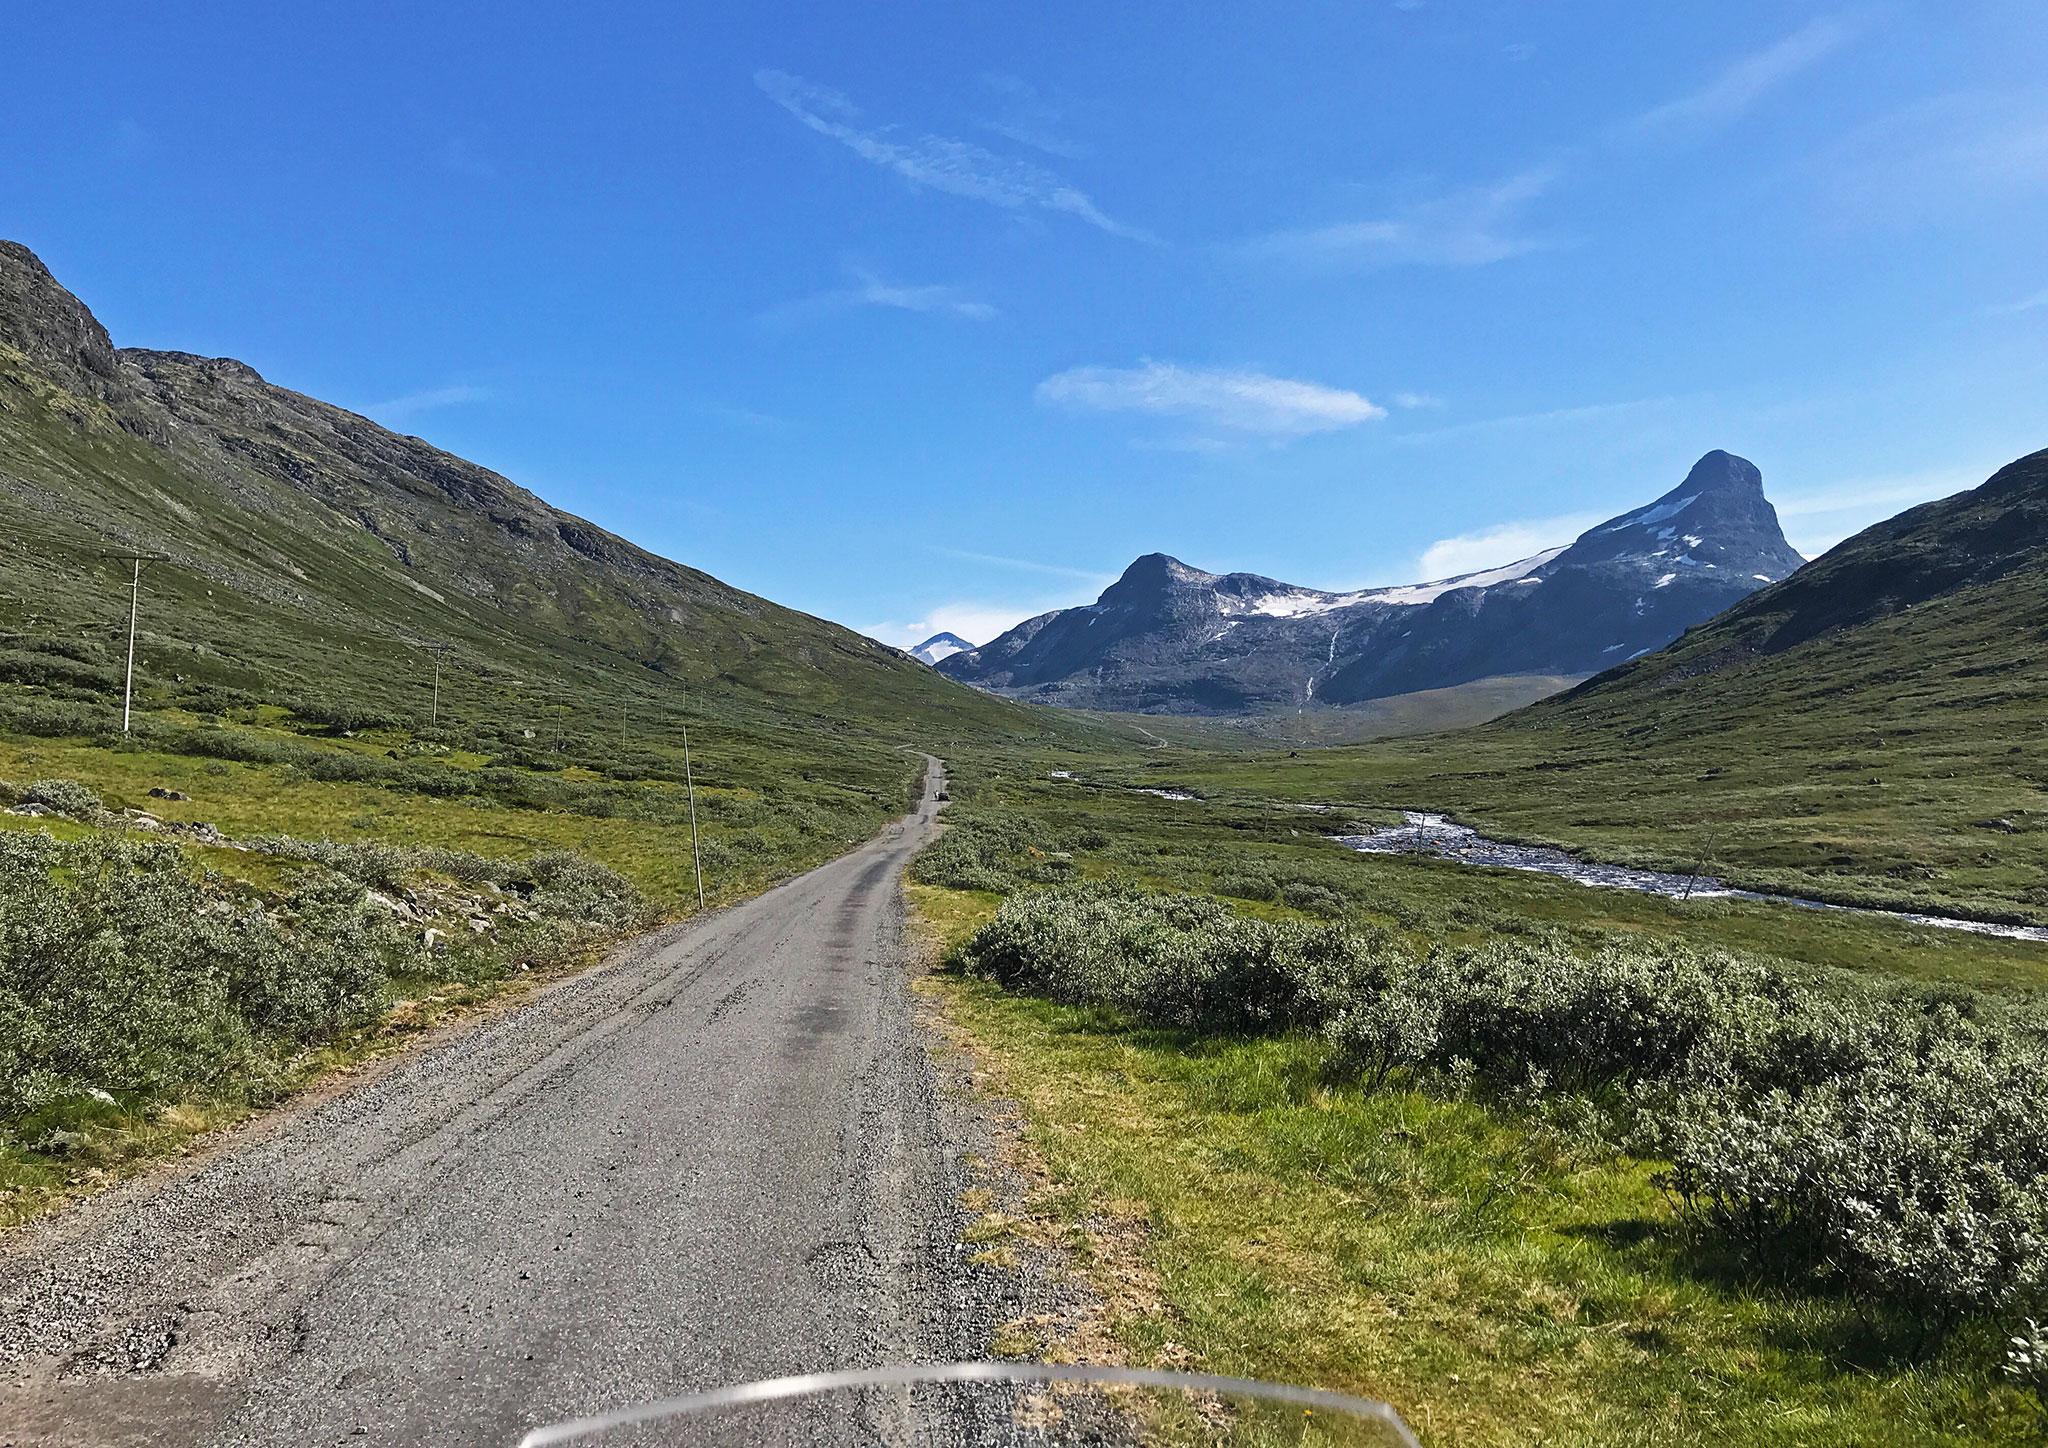 Leirdalsvegen into Leirvassbu and Jotunheimen, one of the few roads into the edge of the national park